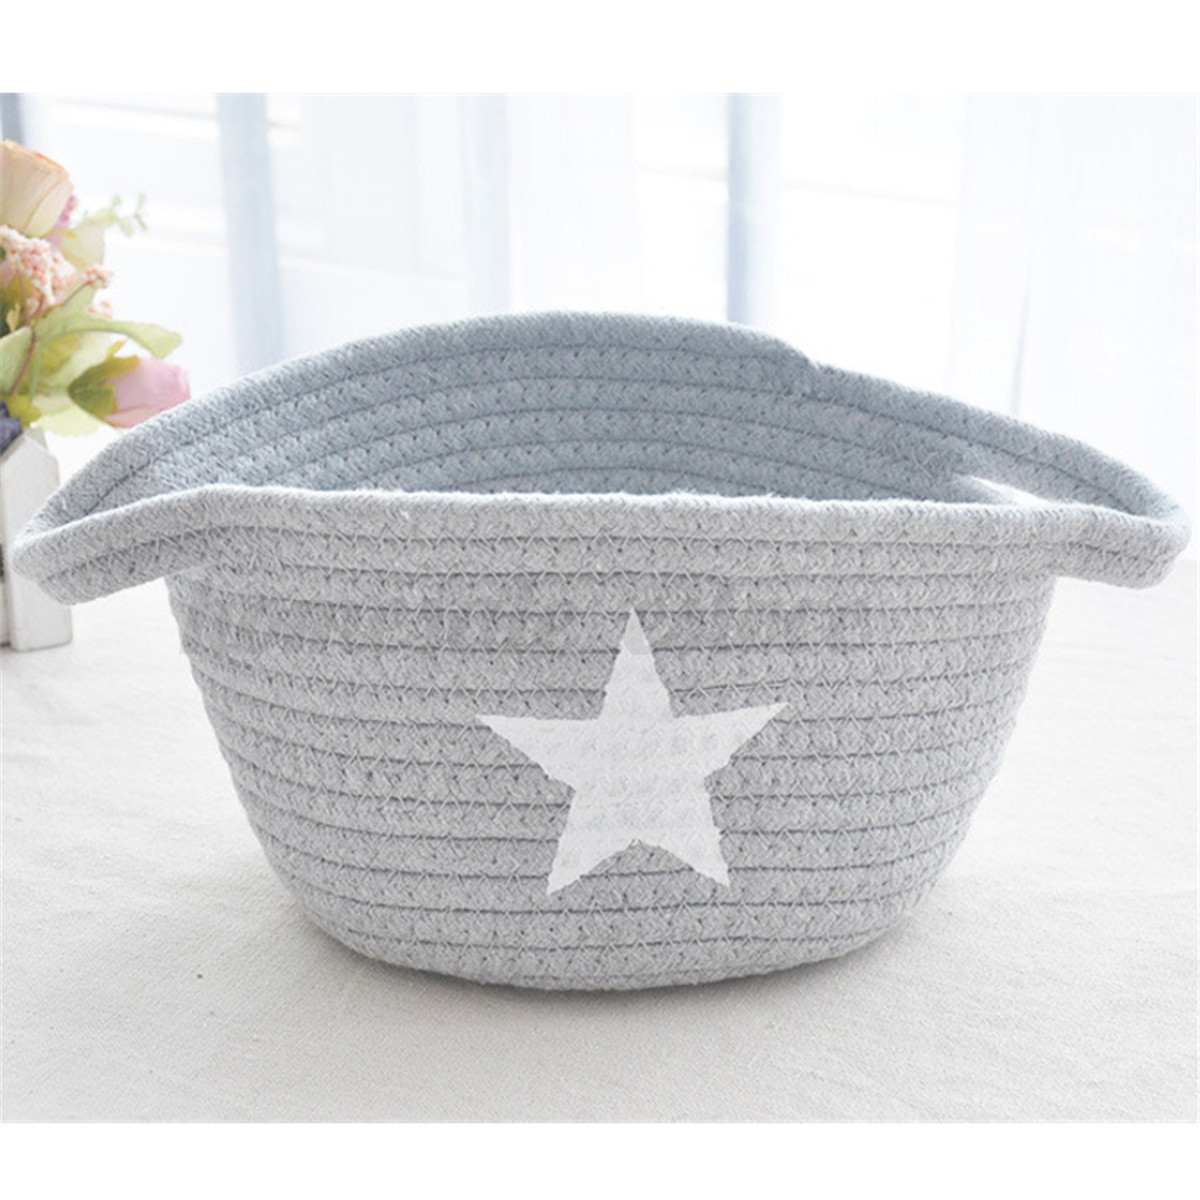 Handmade Cotton Baskets : Cotton handmade yarn sorting woven desktop organizer